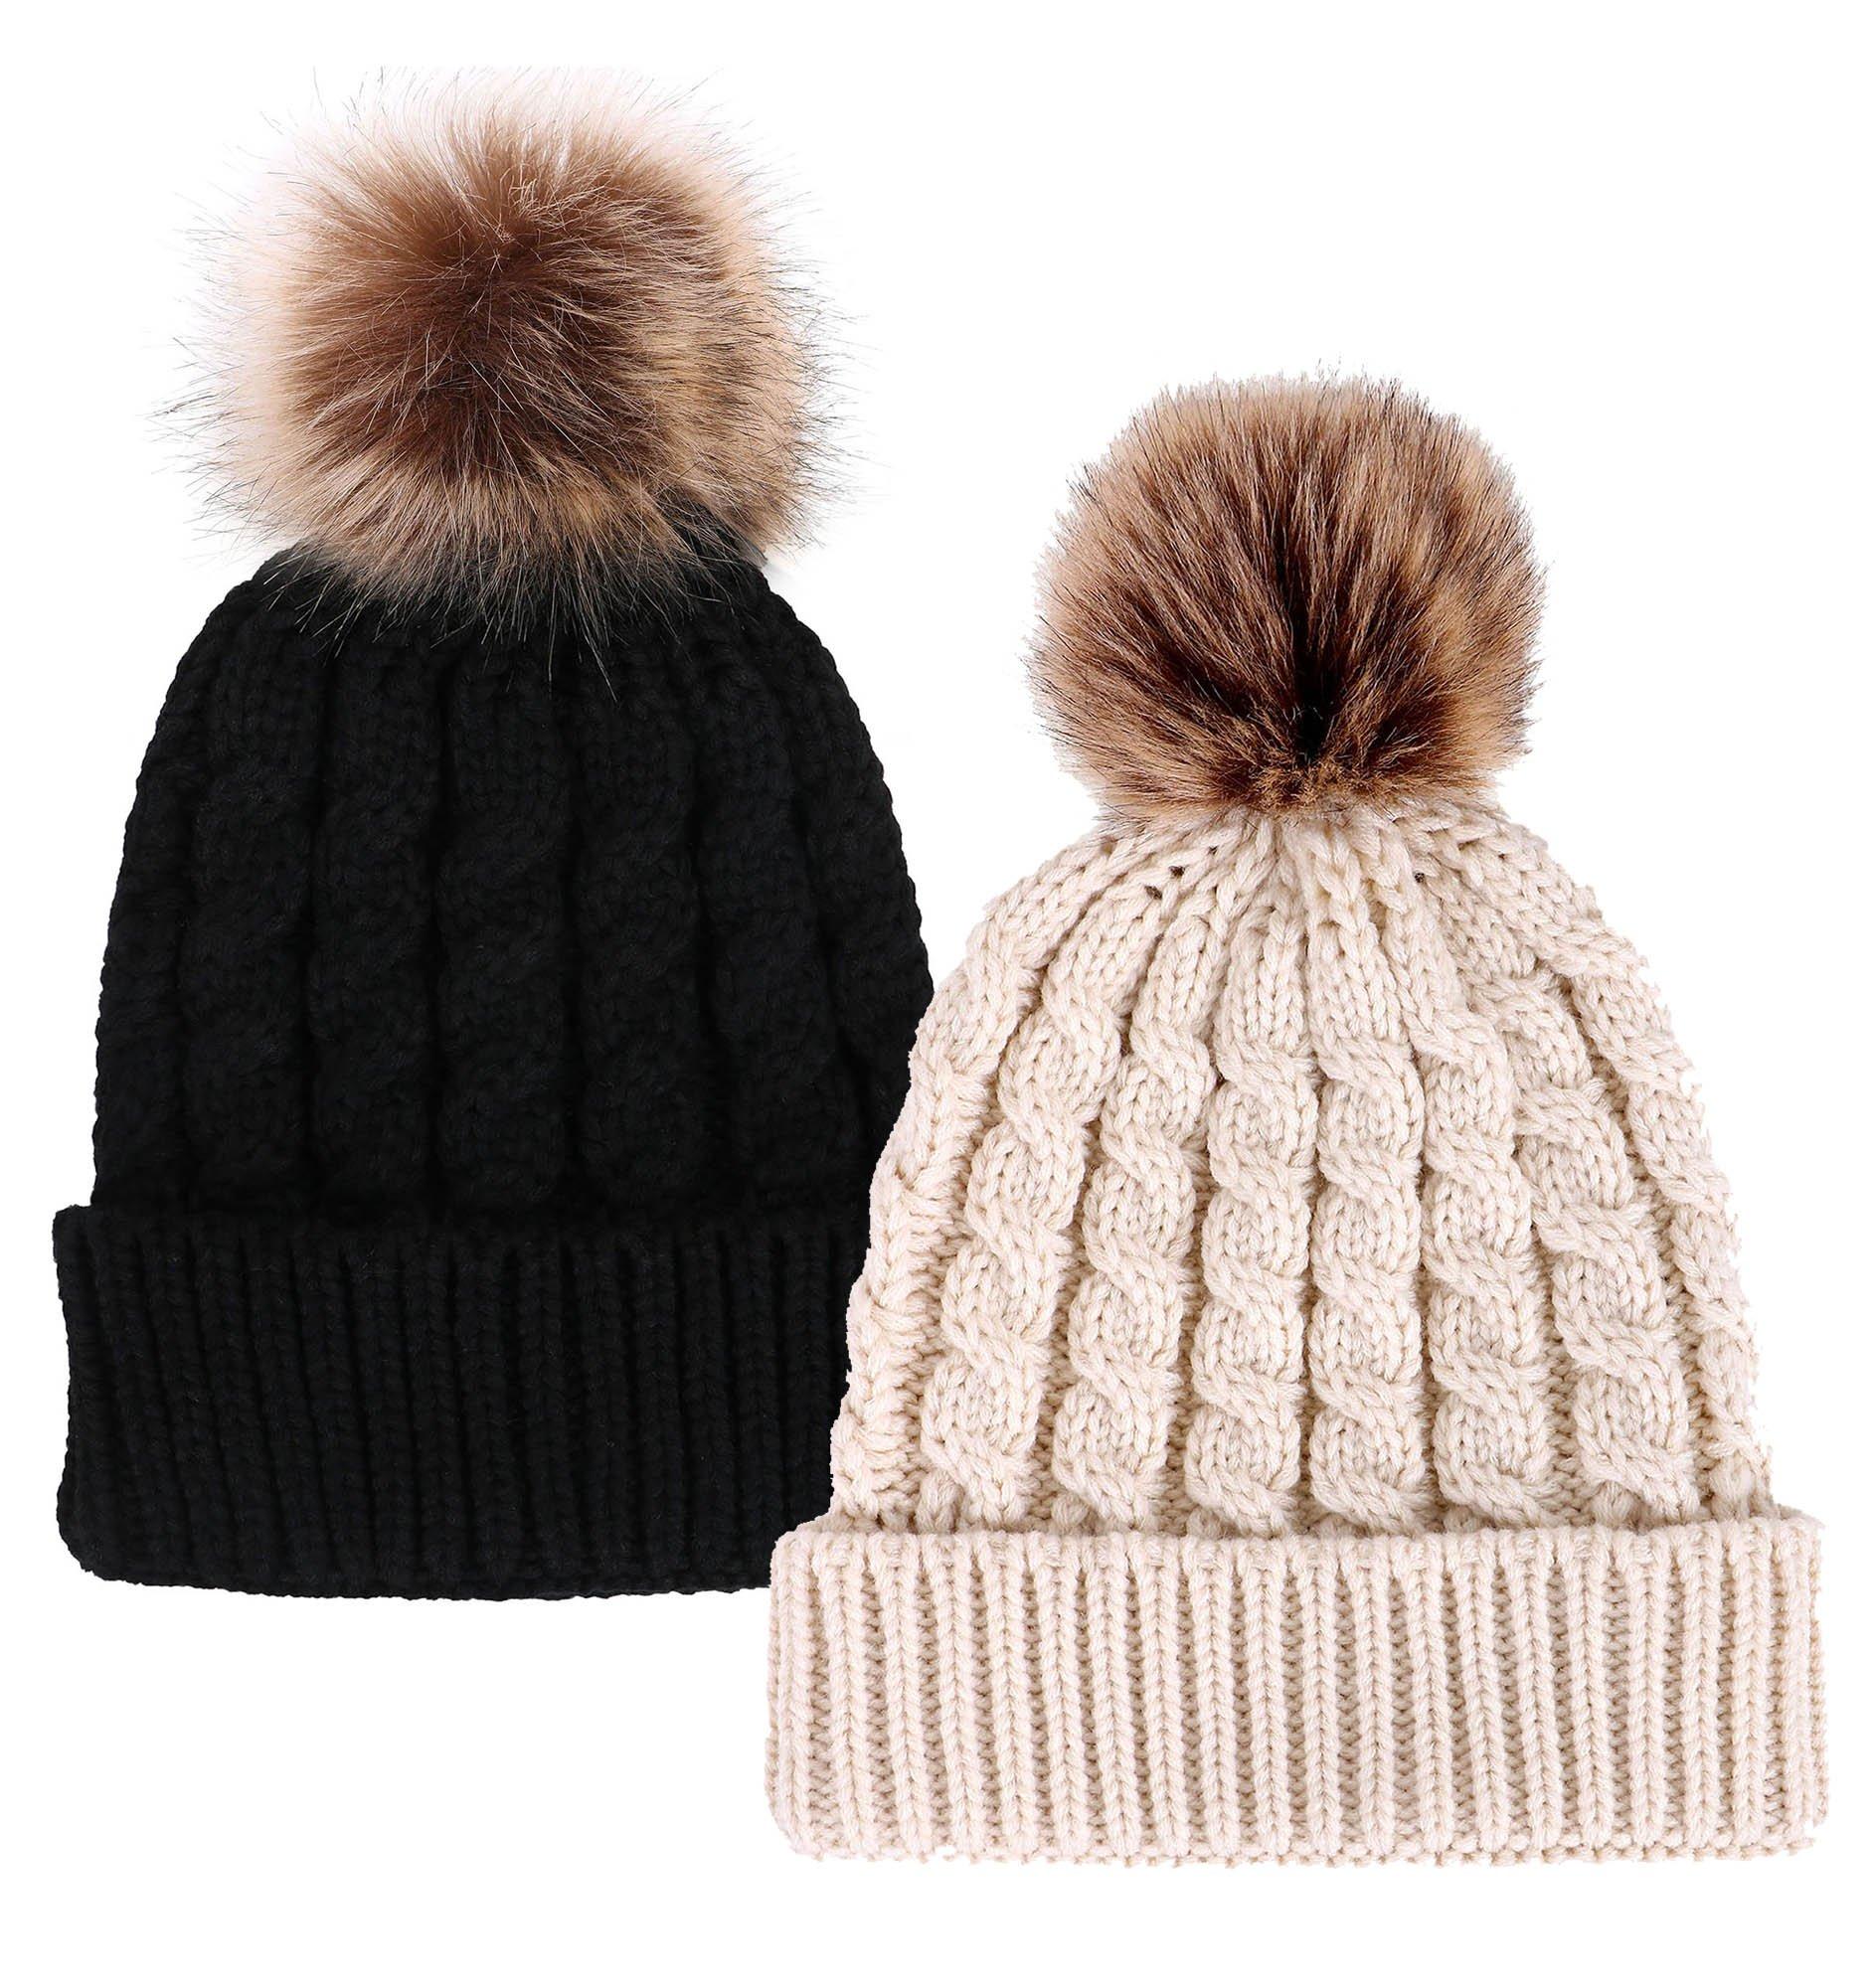 Simplicity Unisex Winter Hand Knit Faux Fur Pompoms Beanie 2 Pieces, Black/Cream by Simplicity